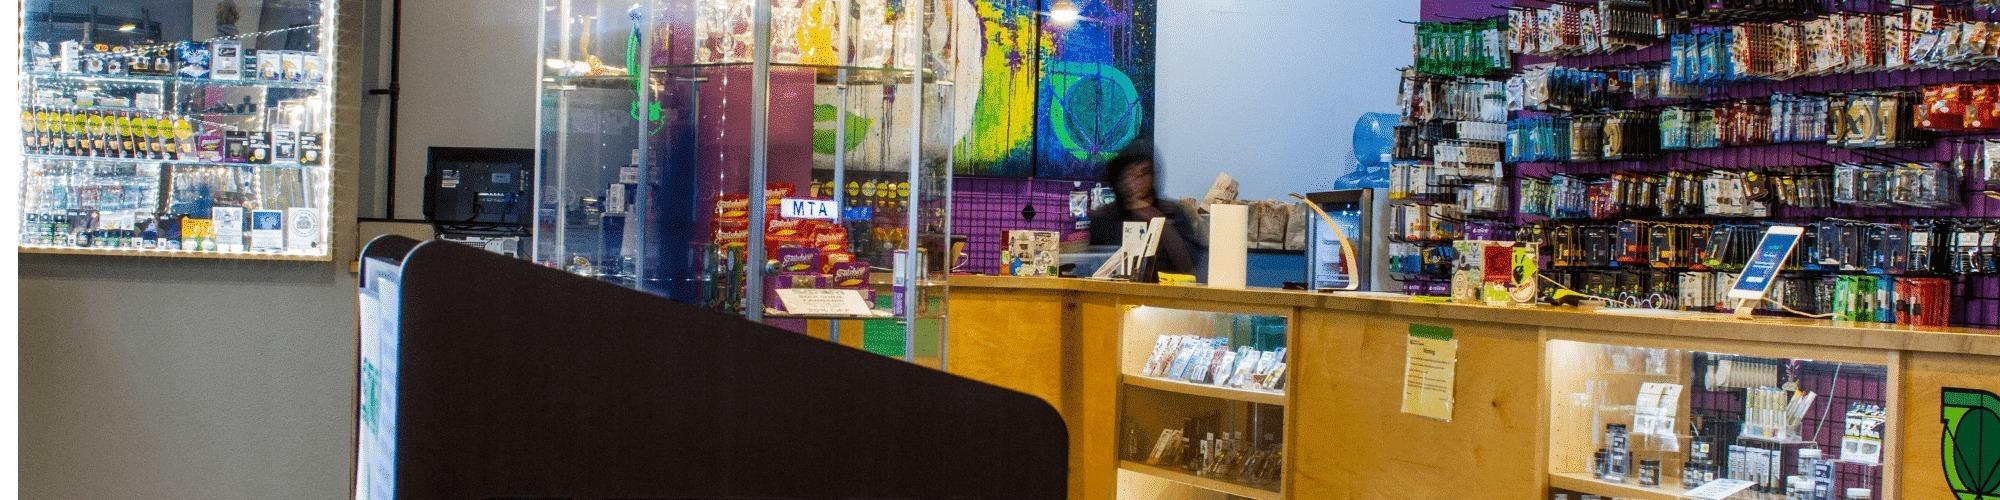 Satori Recreational Cannabis - Seattle Dispensary (@satorirecreationalcannabis) Cover Image